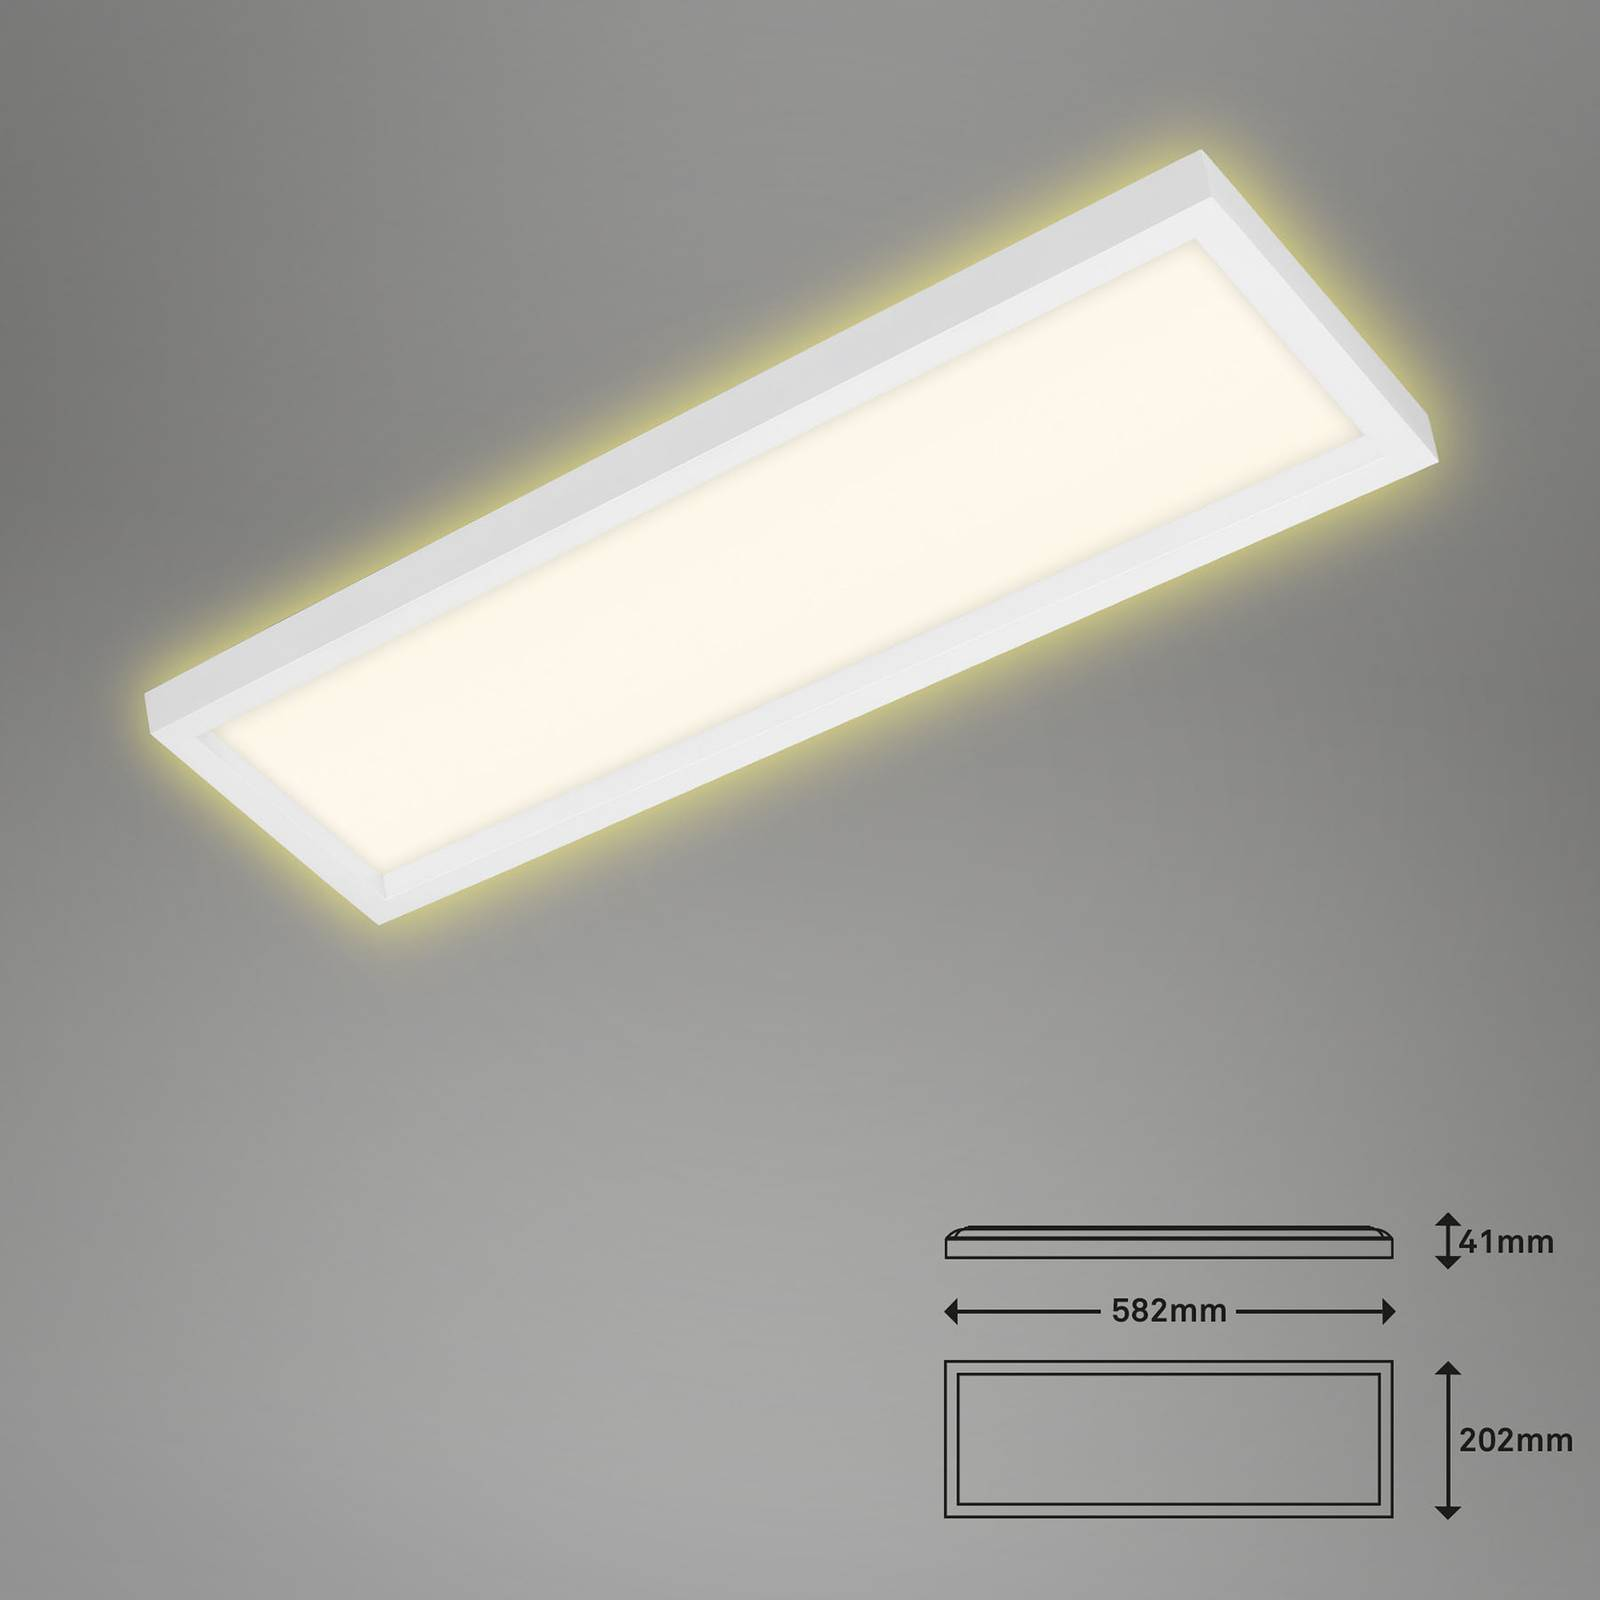 LED plafondlamp 7365, 58 x 20 cm, wit